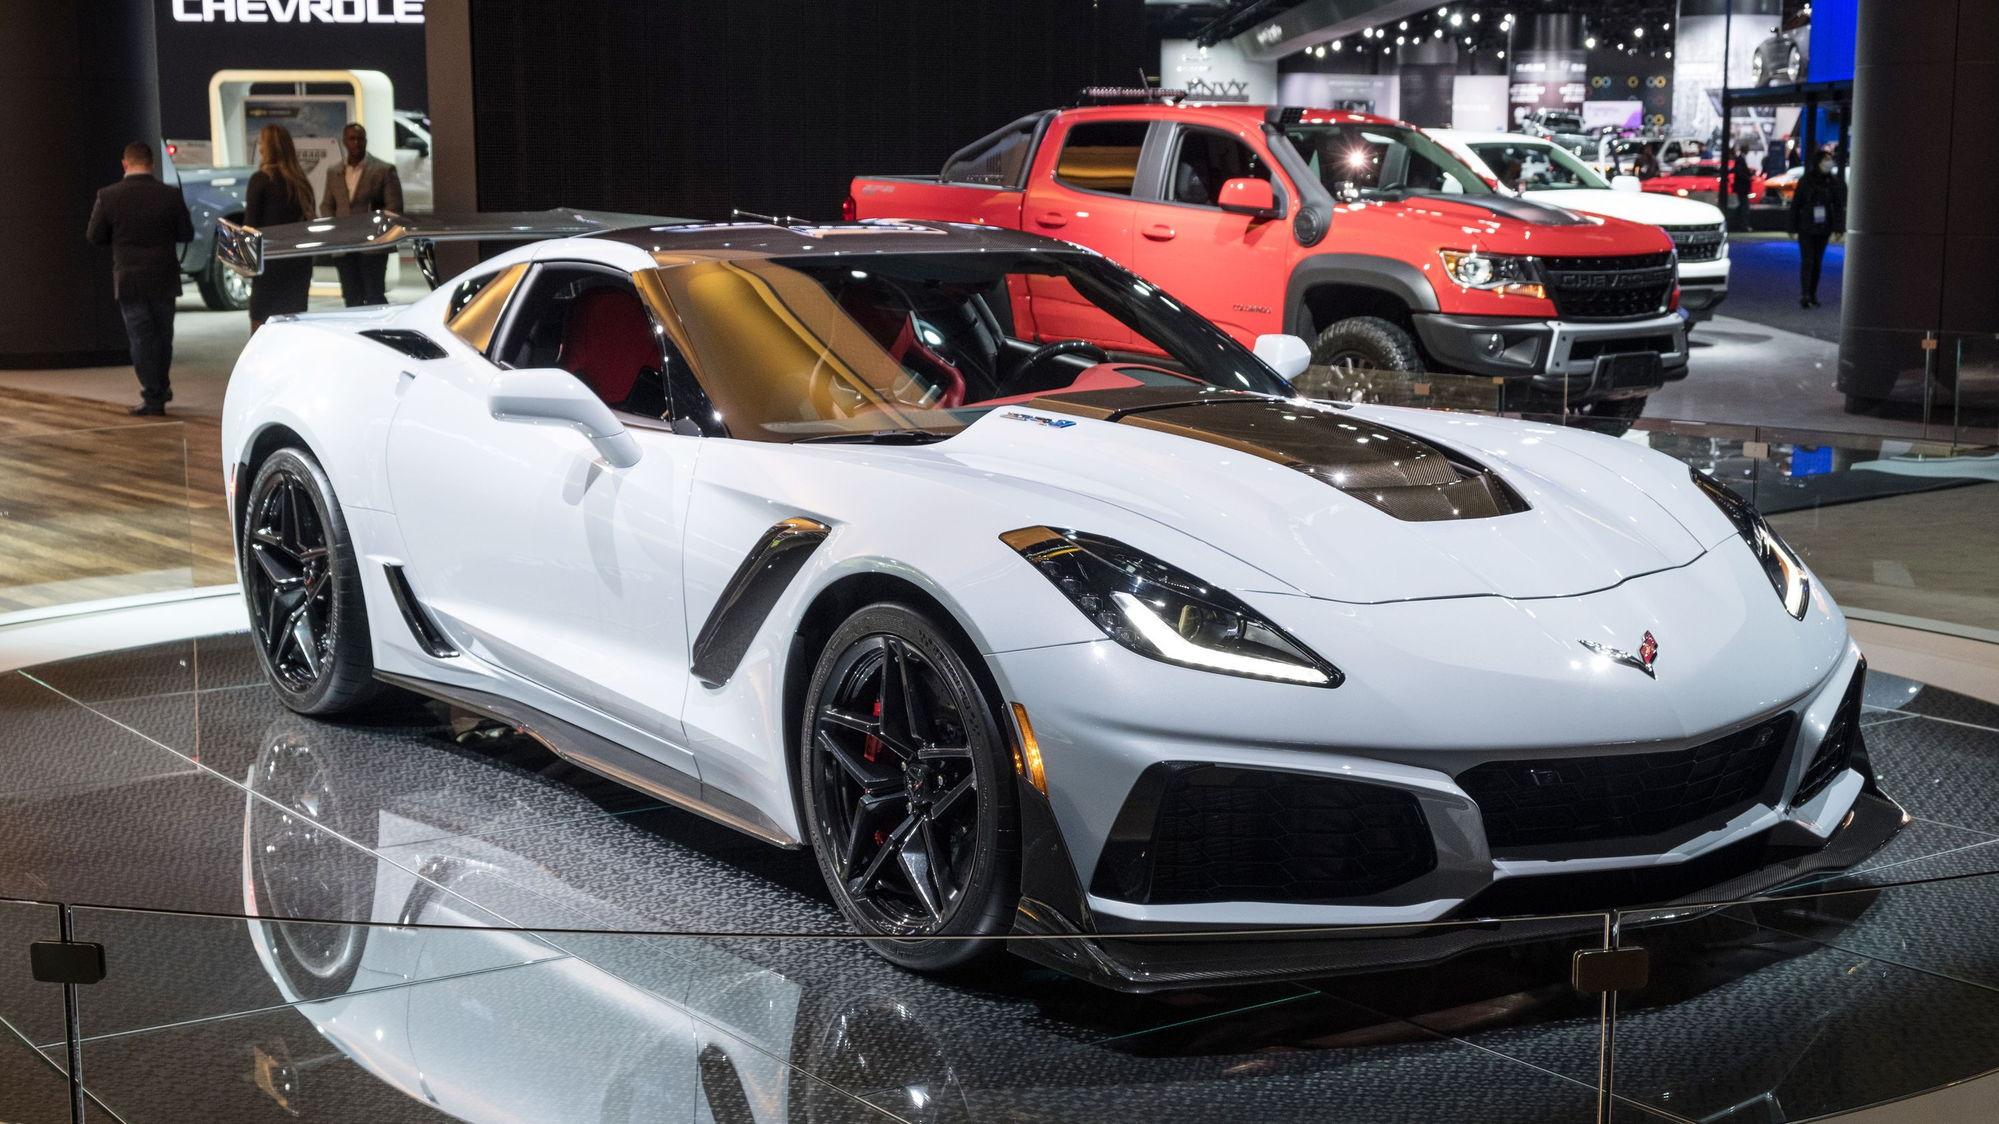 White C8 vs C7 ZR1 - CorvetteForum - Chevrolet Corvette ...